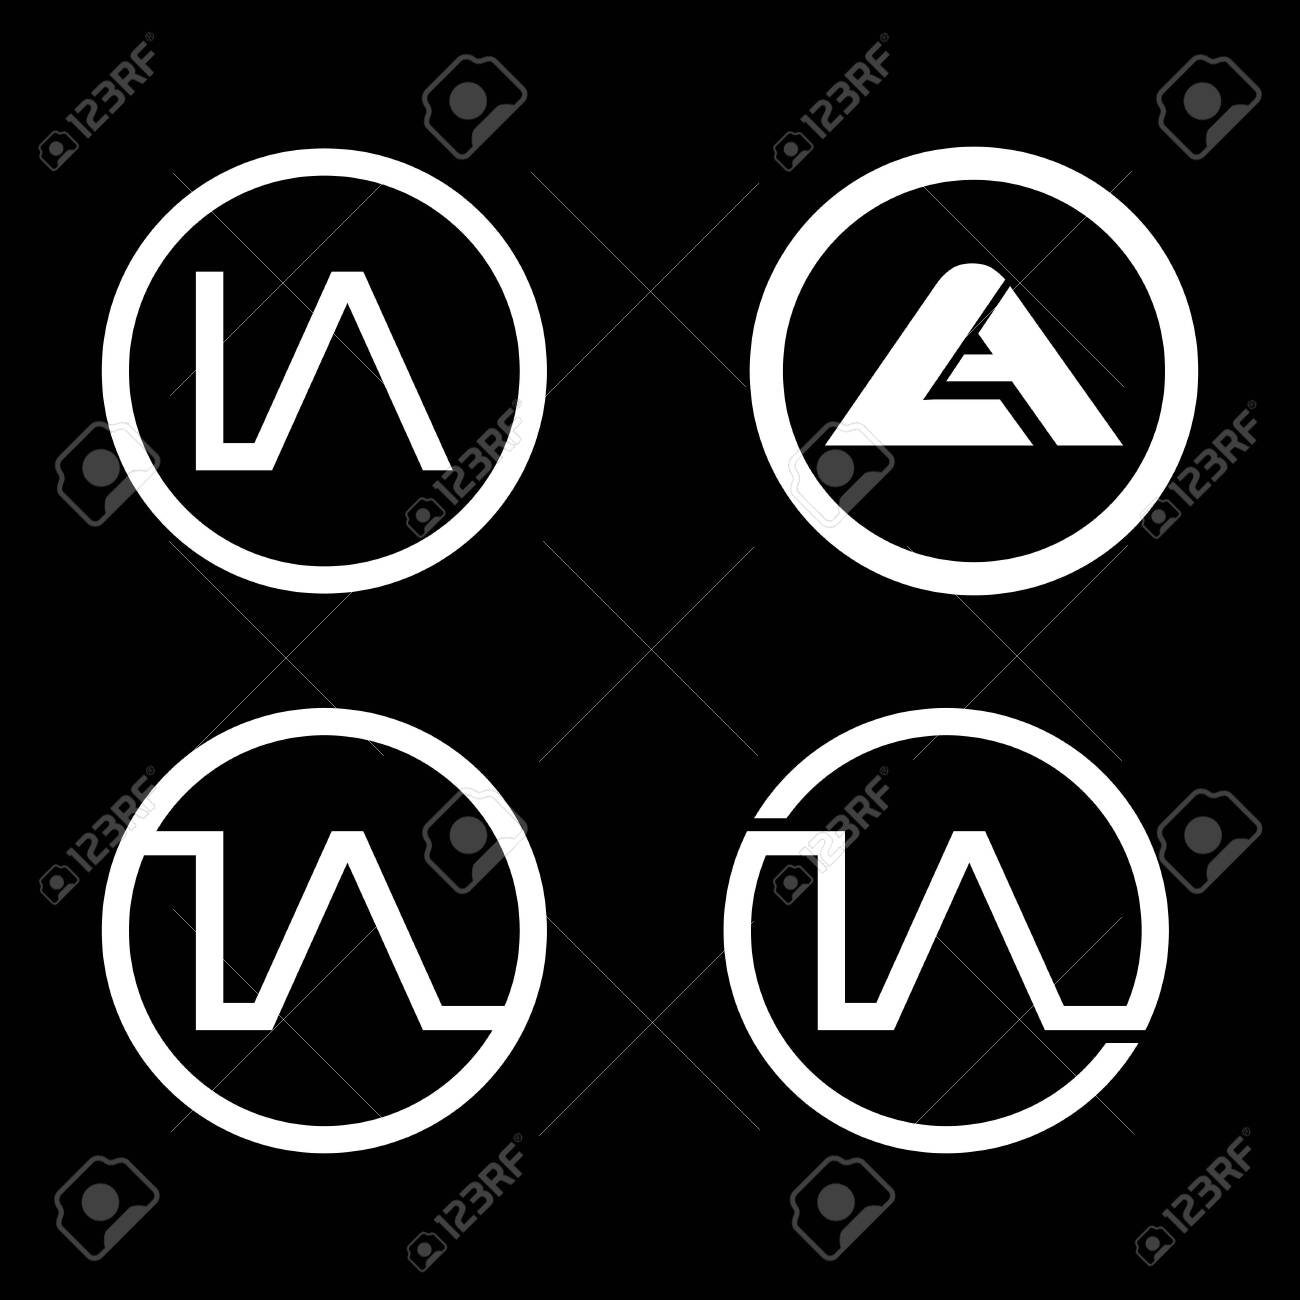 circle letter LA logo template bundle set - 144011355